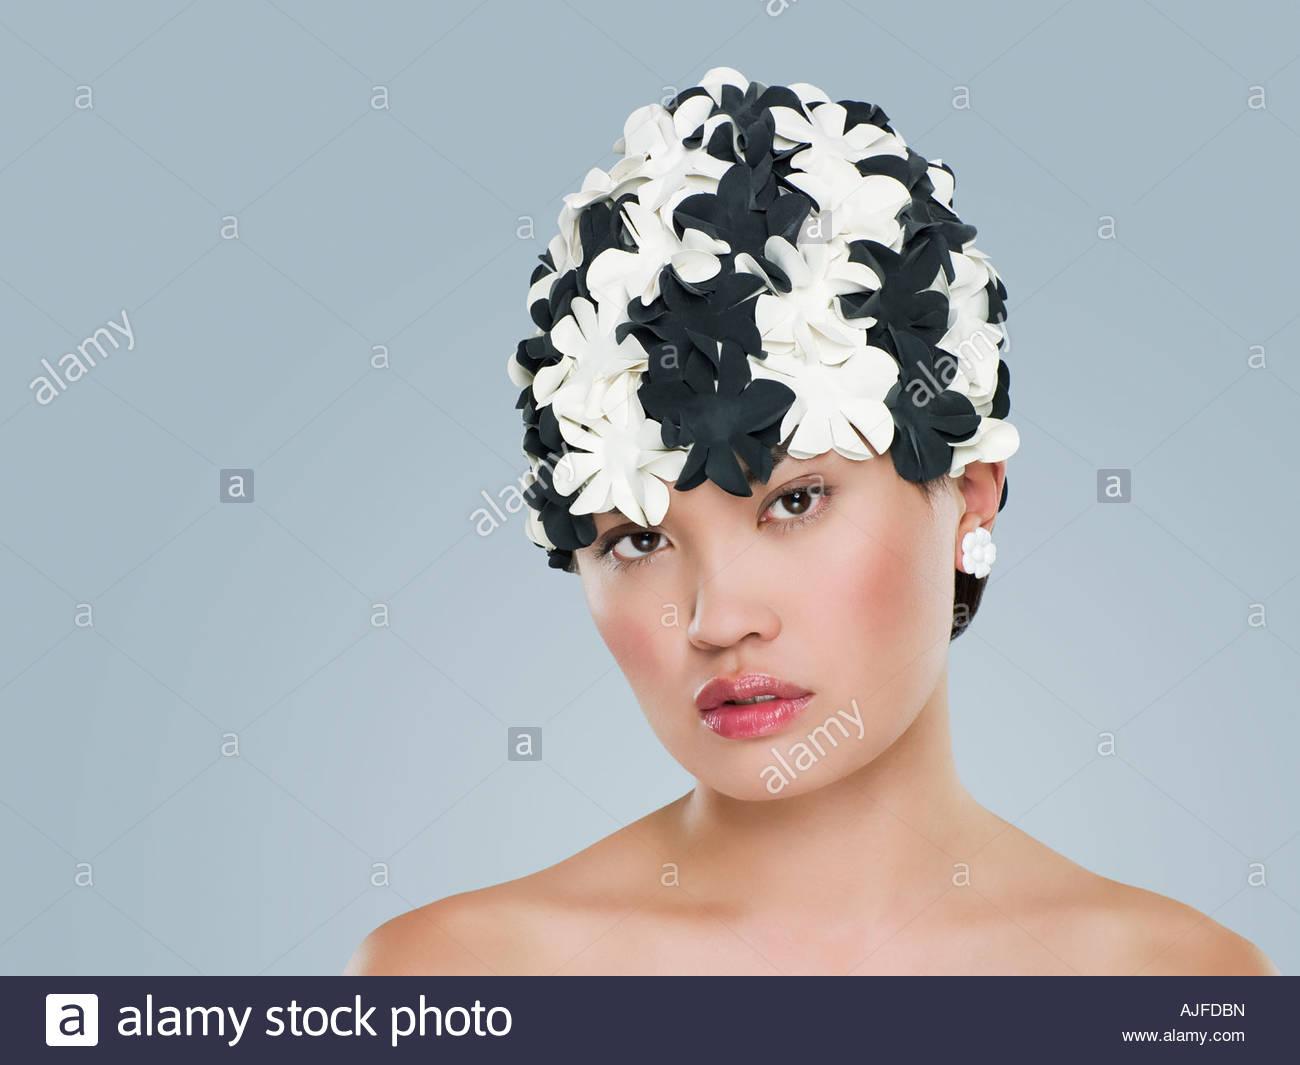 Frau mit Blumen Hut Stockbild